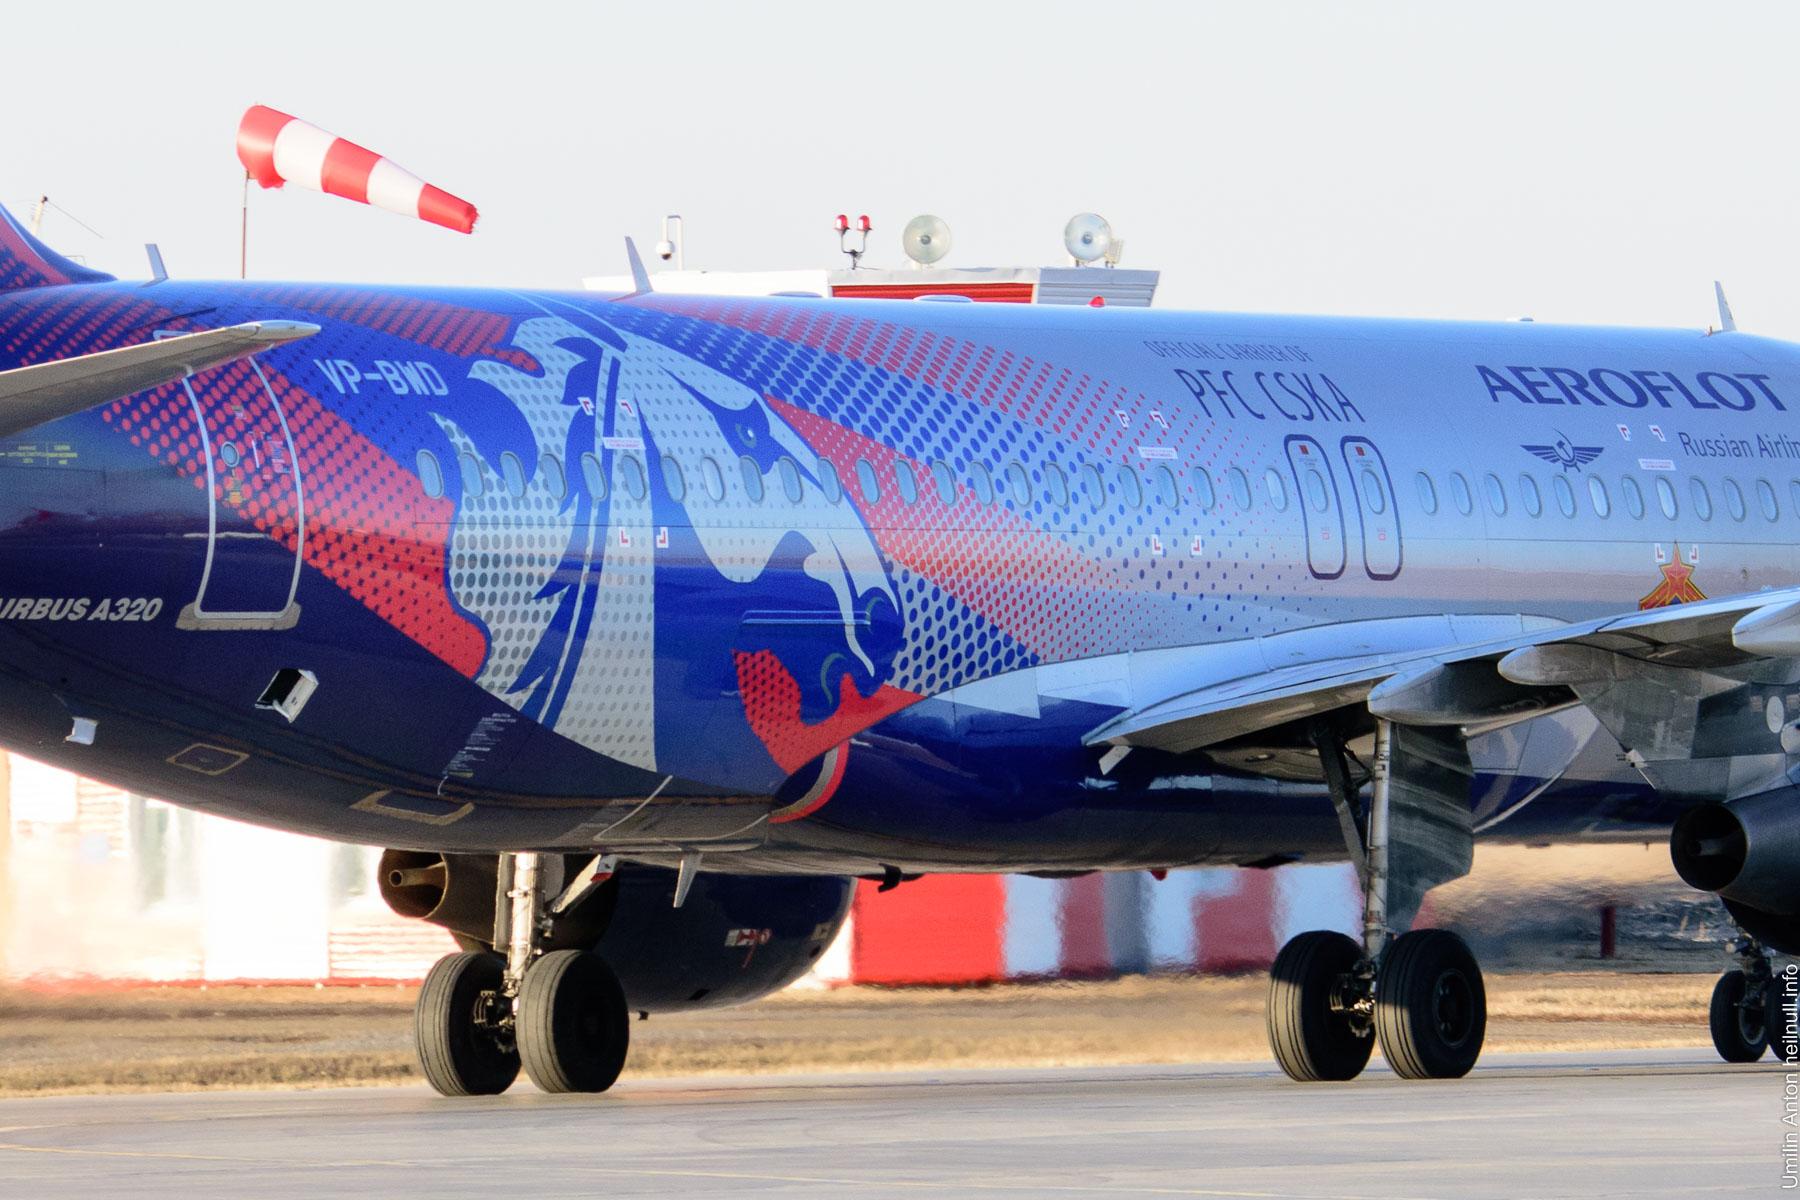 UAY_4442-16